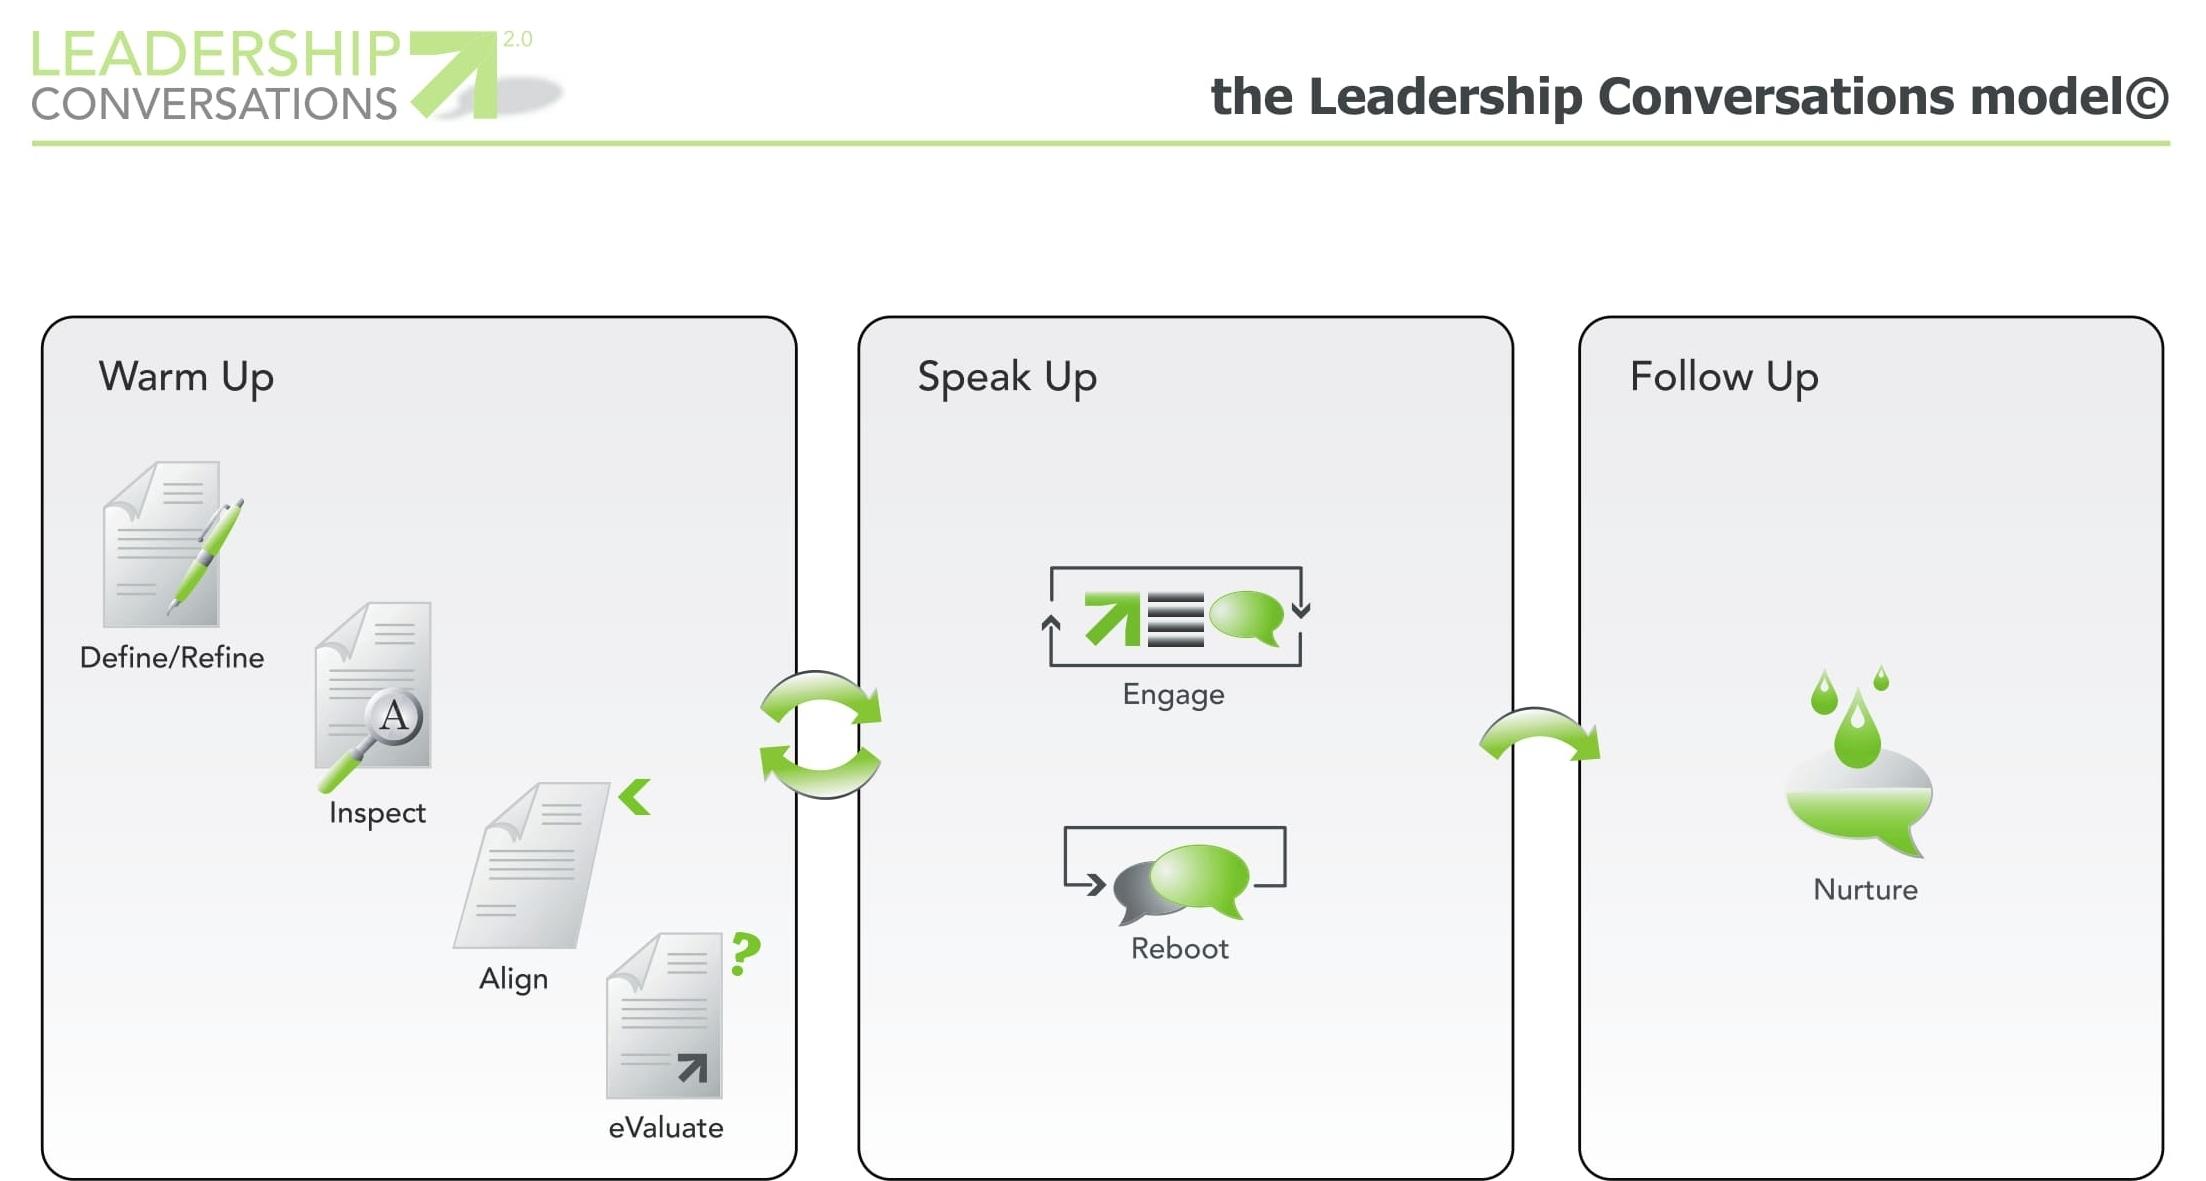 Leadership Conversations© - 2008-2017 Javier Bajer - All Rights Reserved - www.javierbajer.com